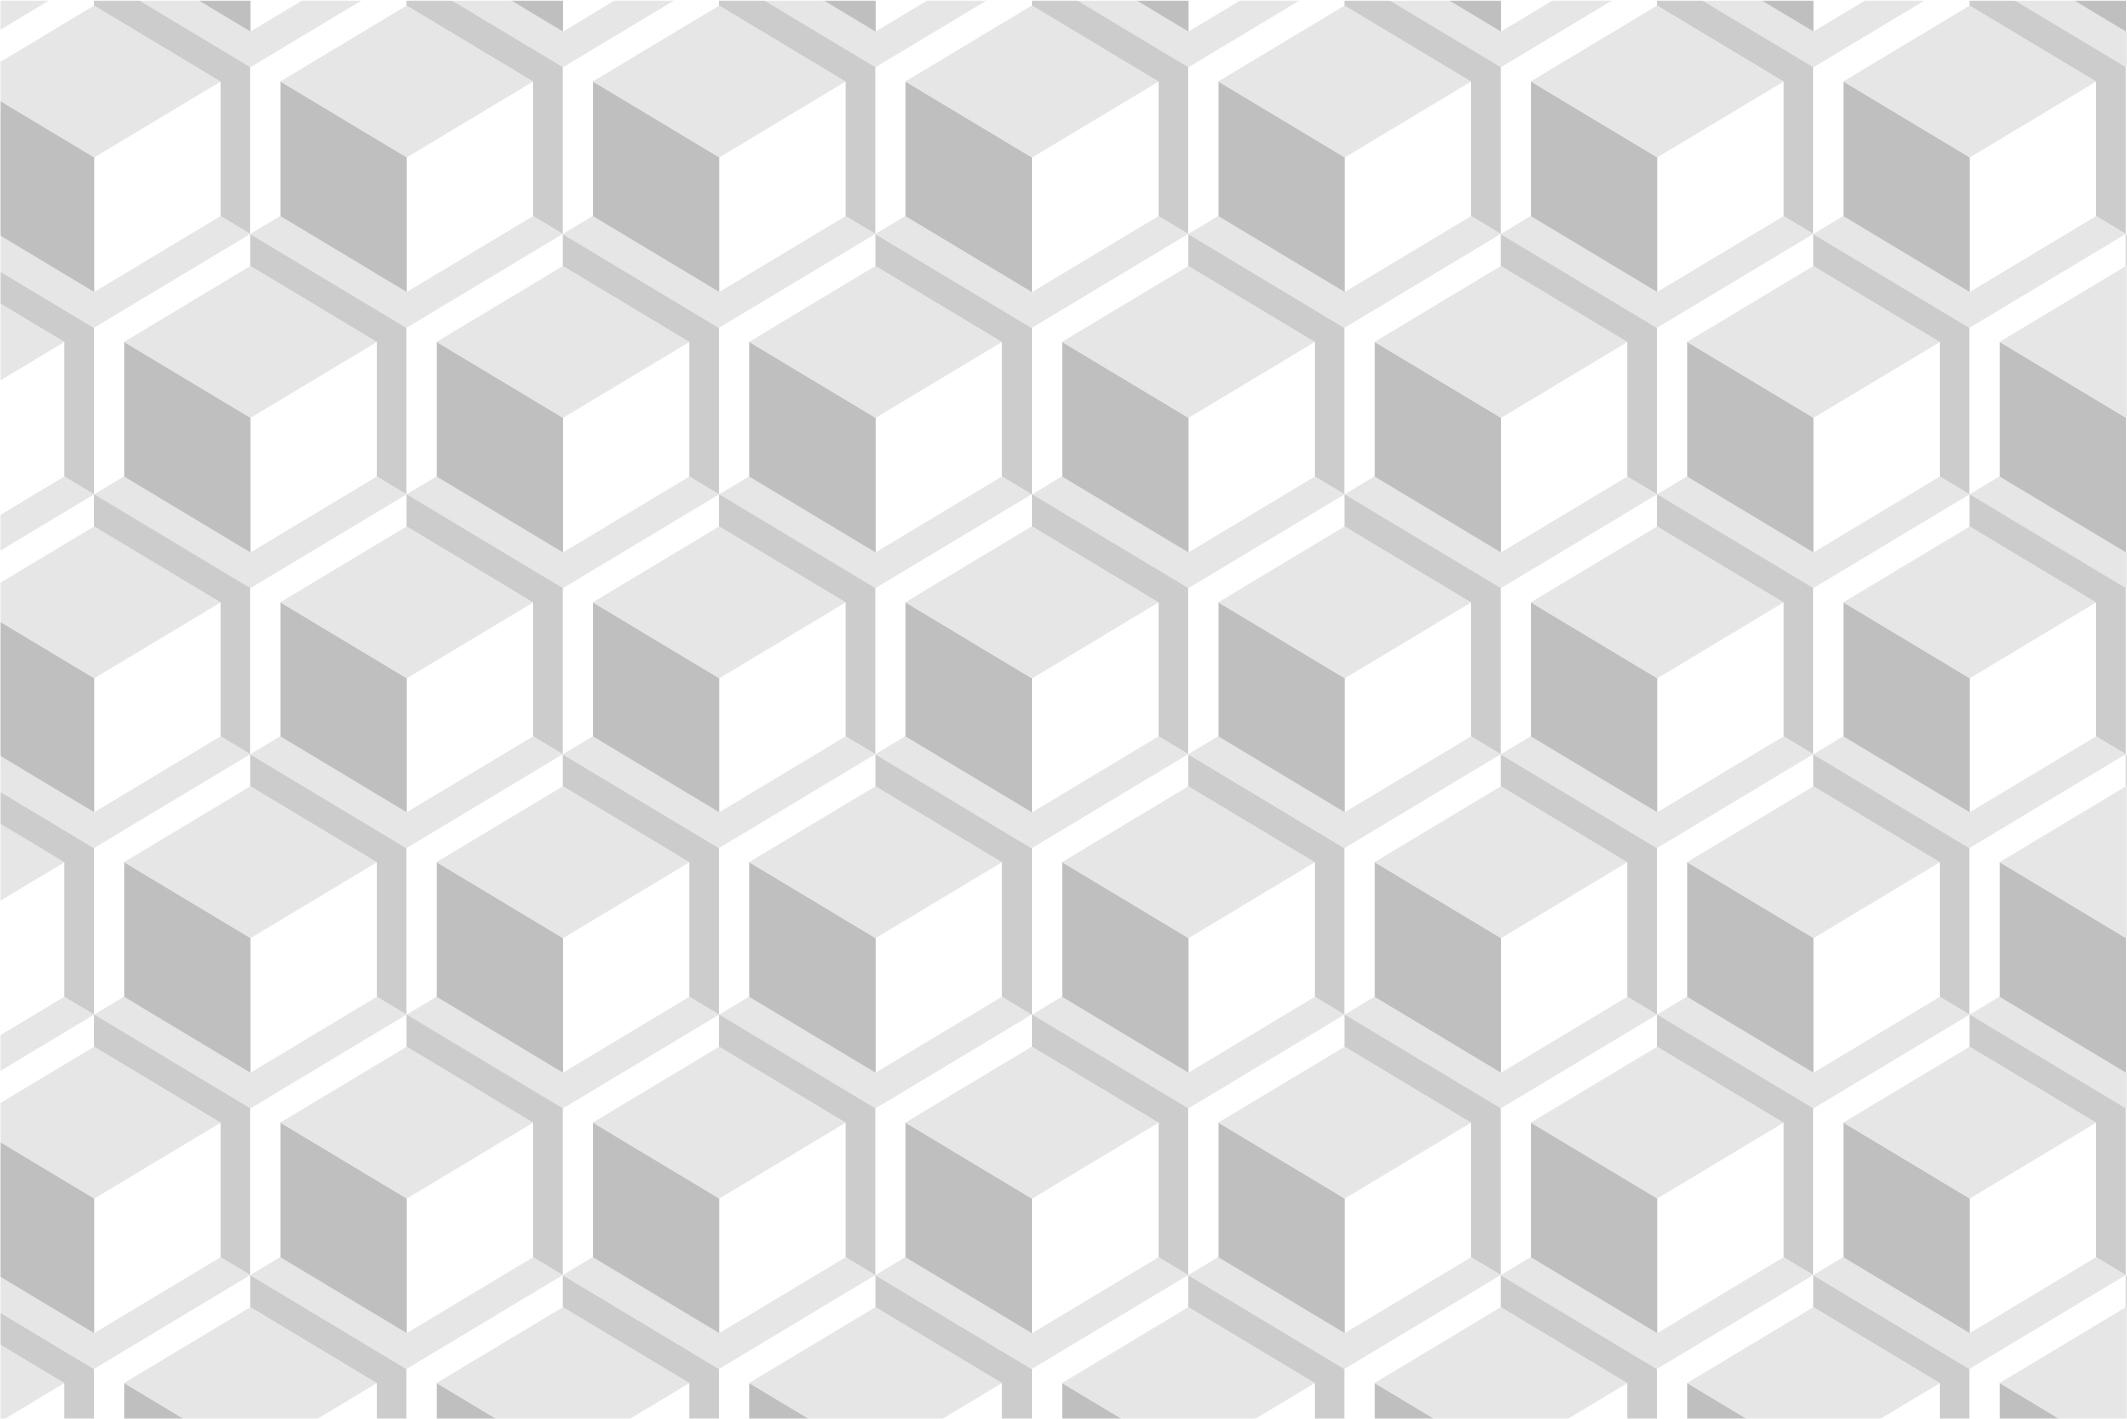 Geometric white 3d seamless textures example image 6